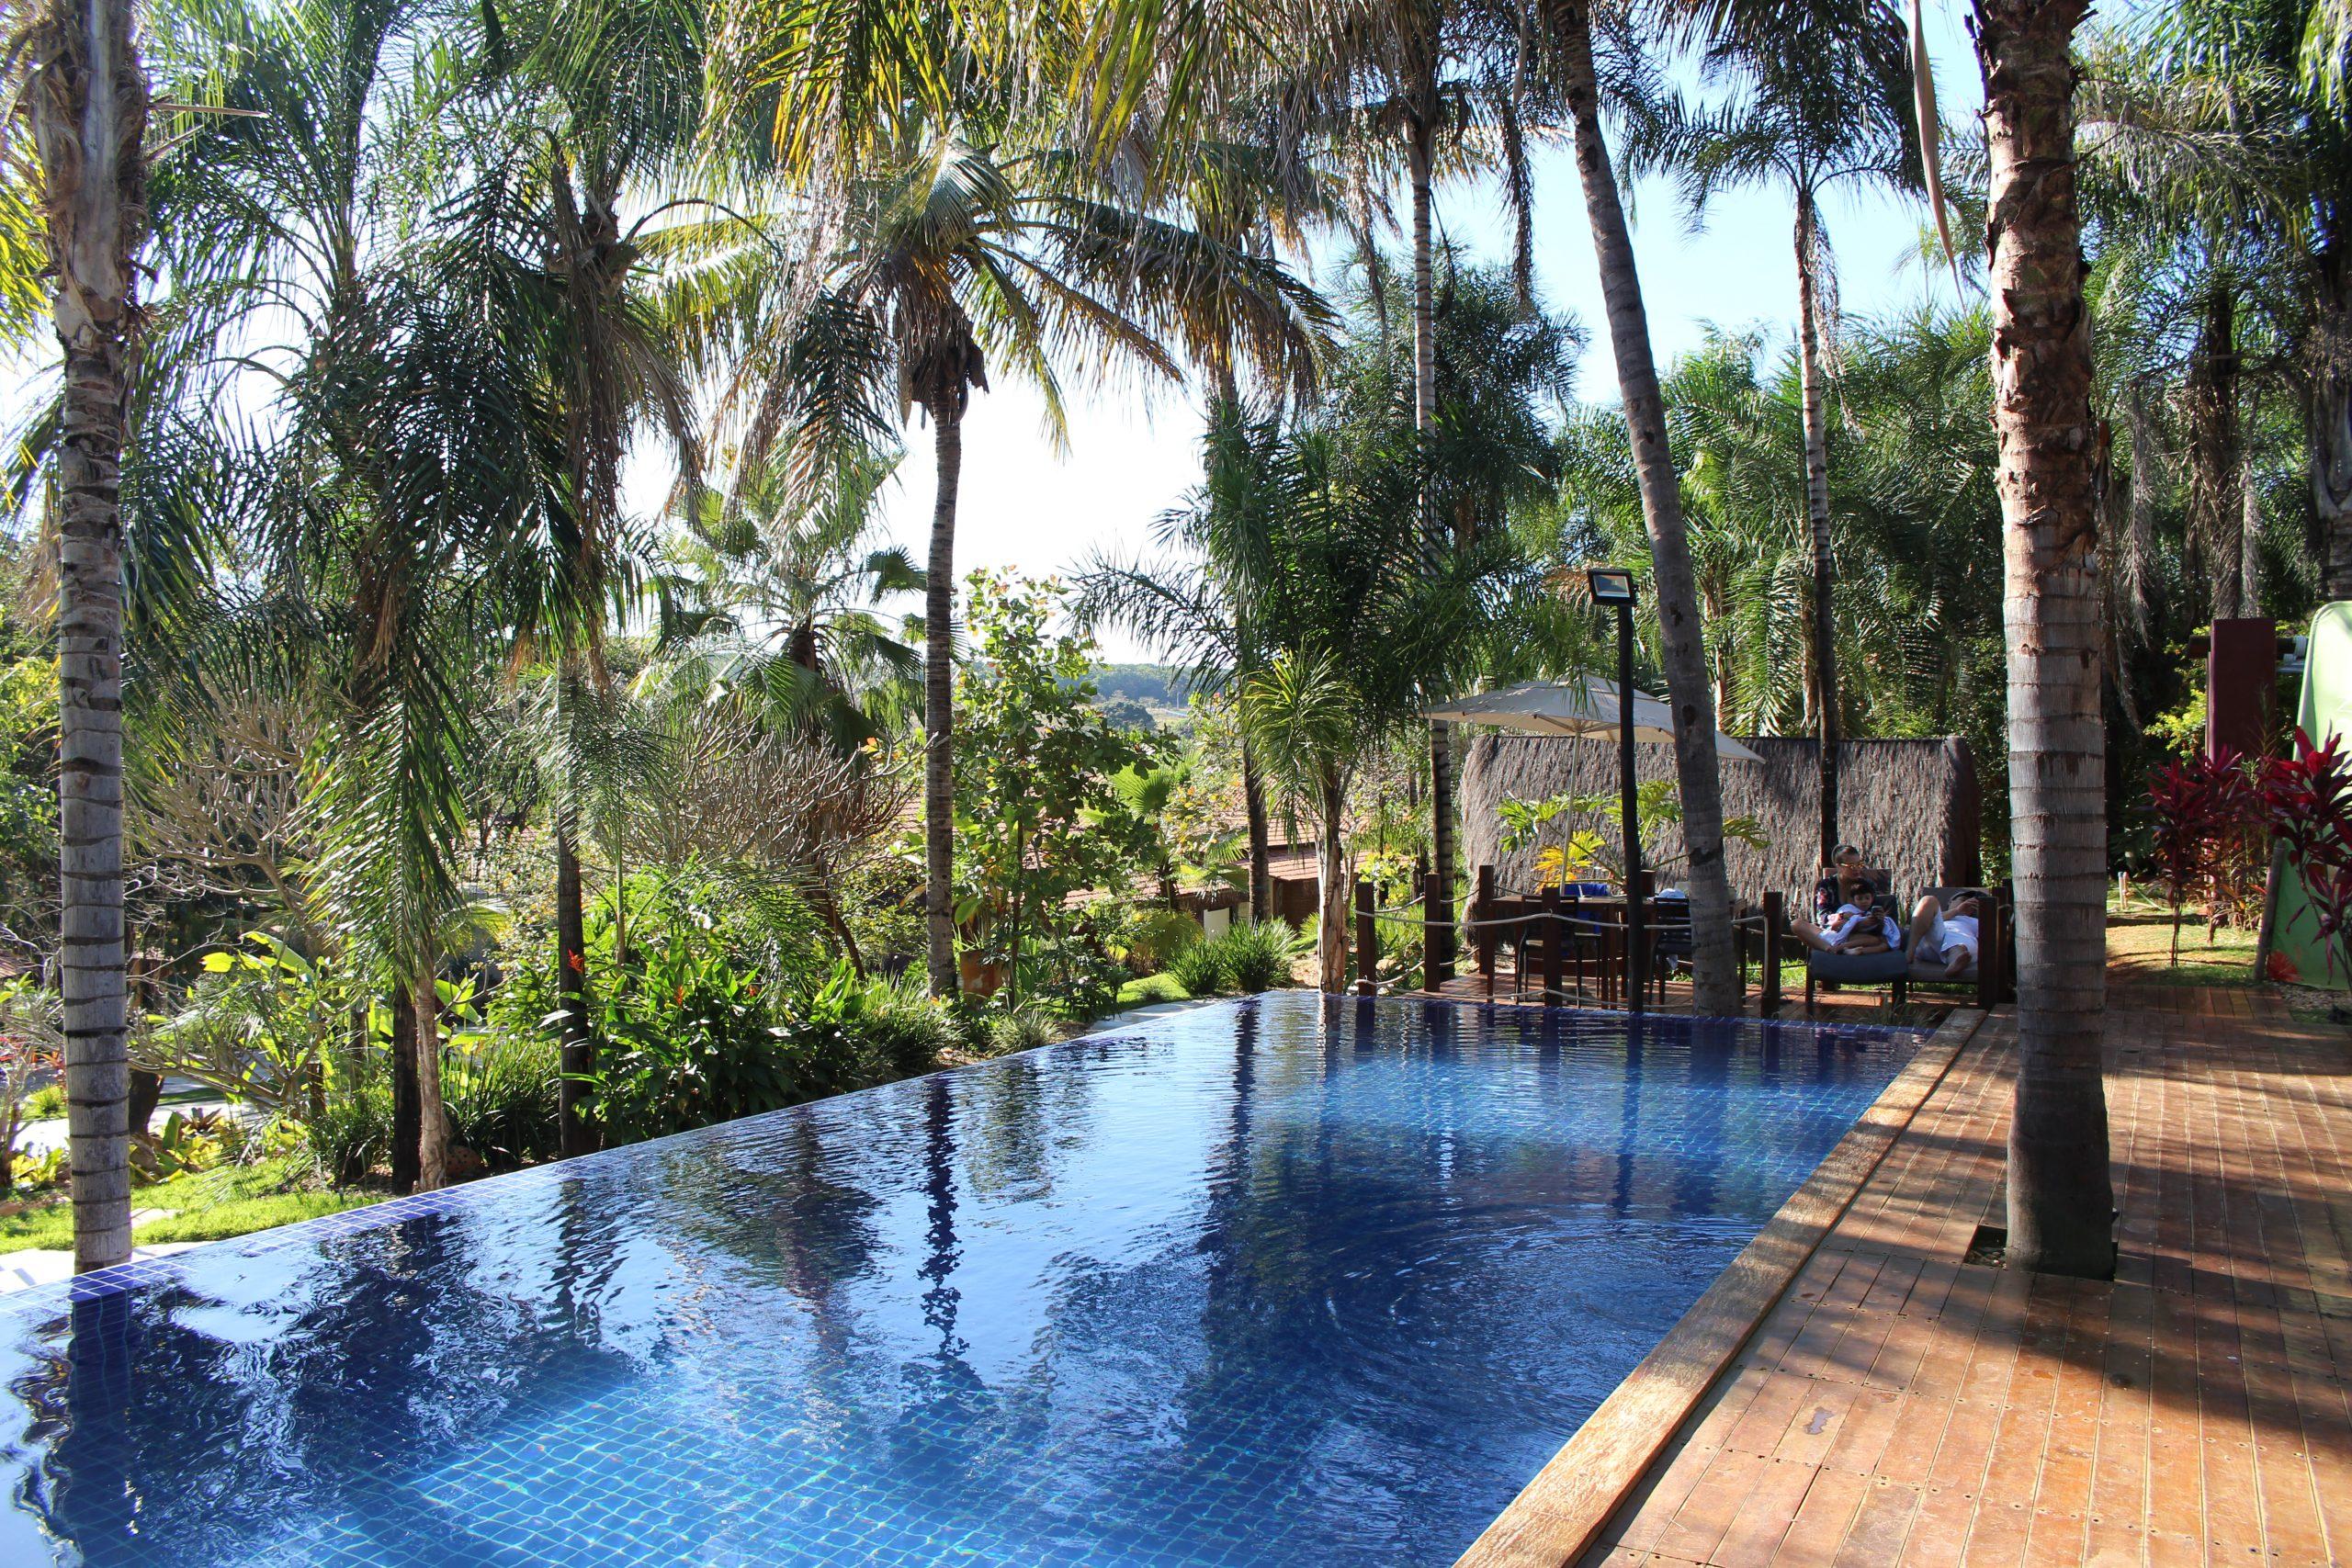 piscina_aquecida_villa_do_comendador